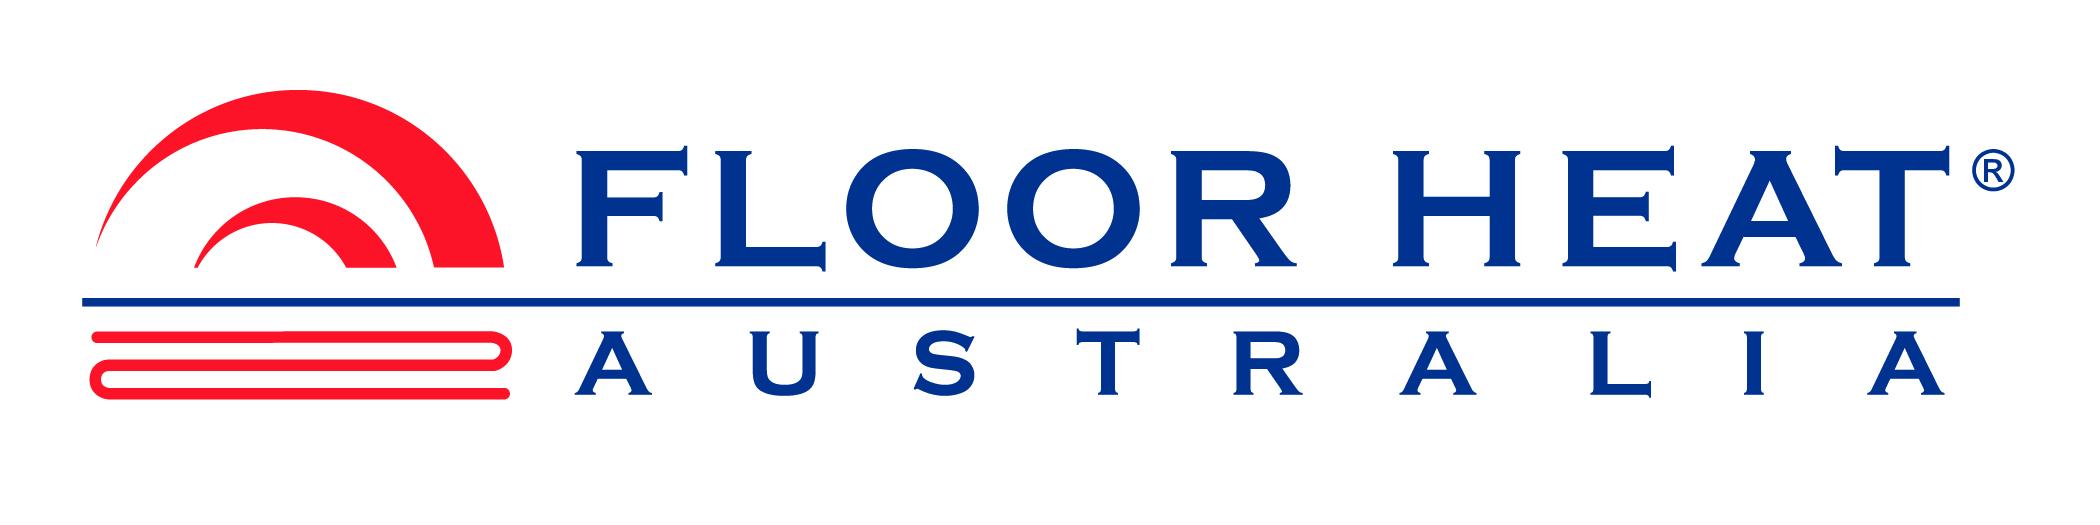 Floor Heat Australia Devex Systems